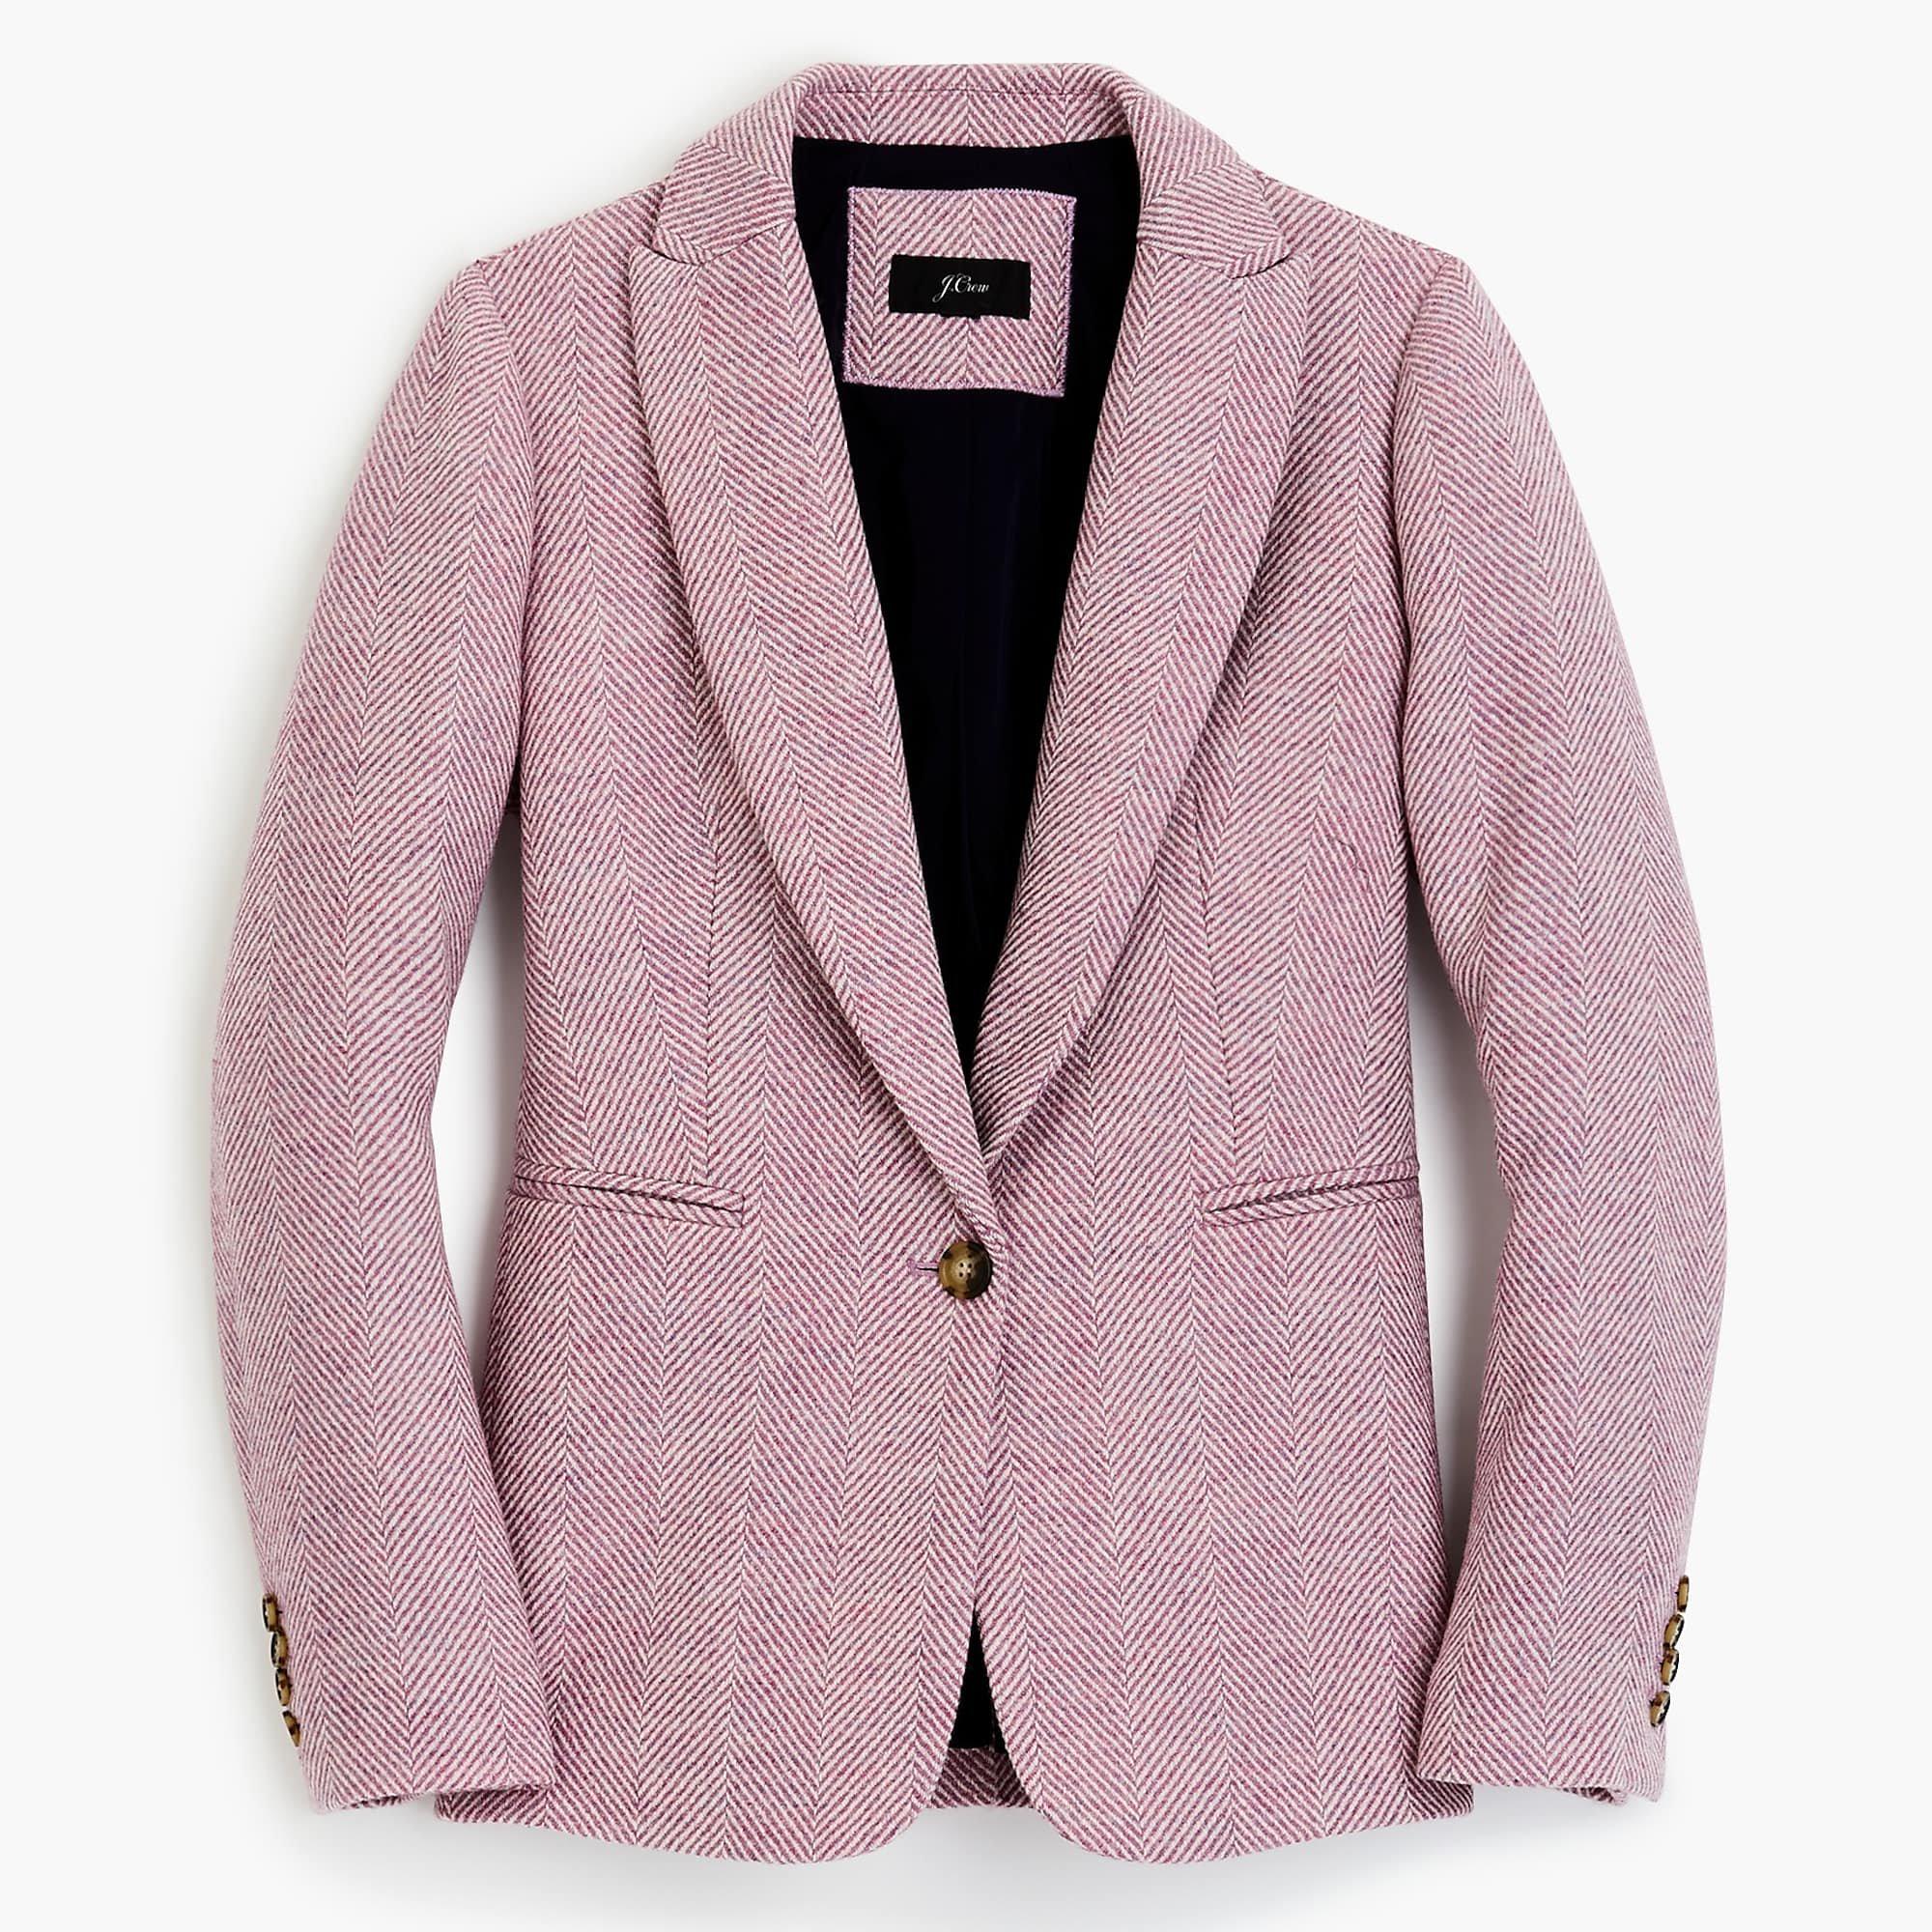 J.Crew: Parke blazer in English herringbone wool